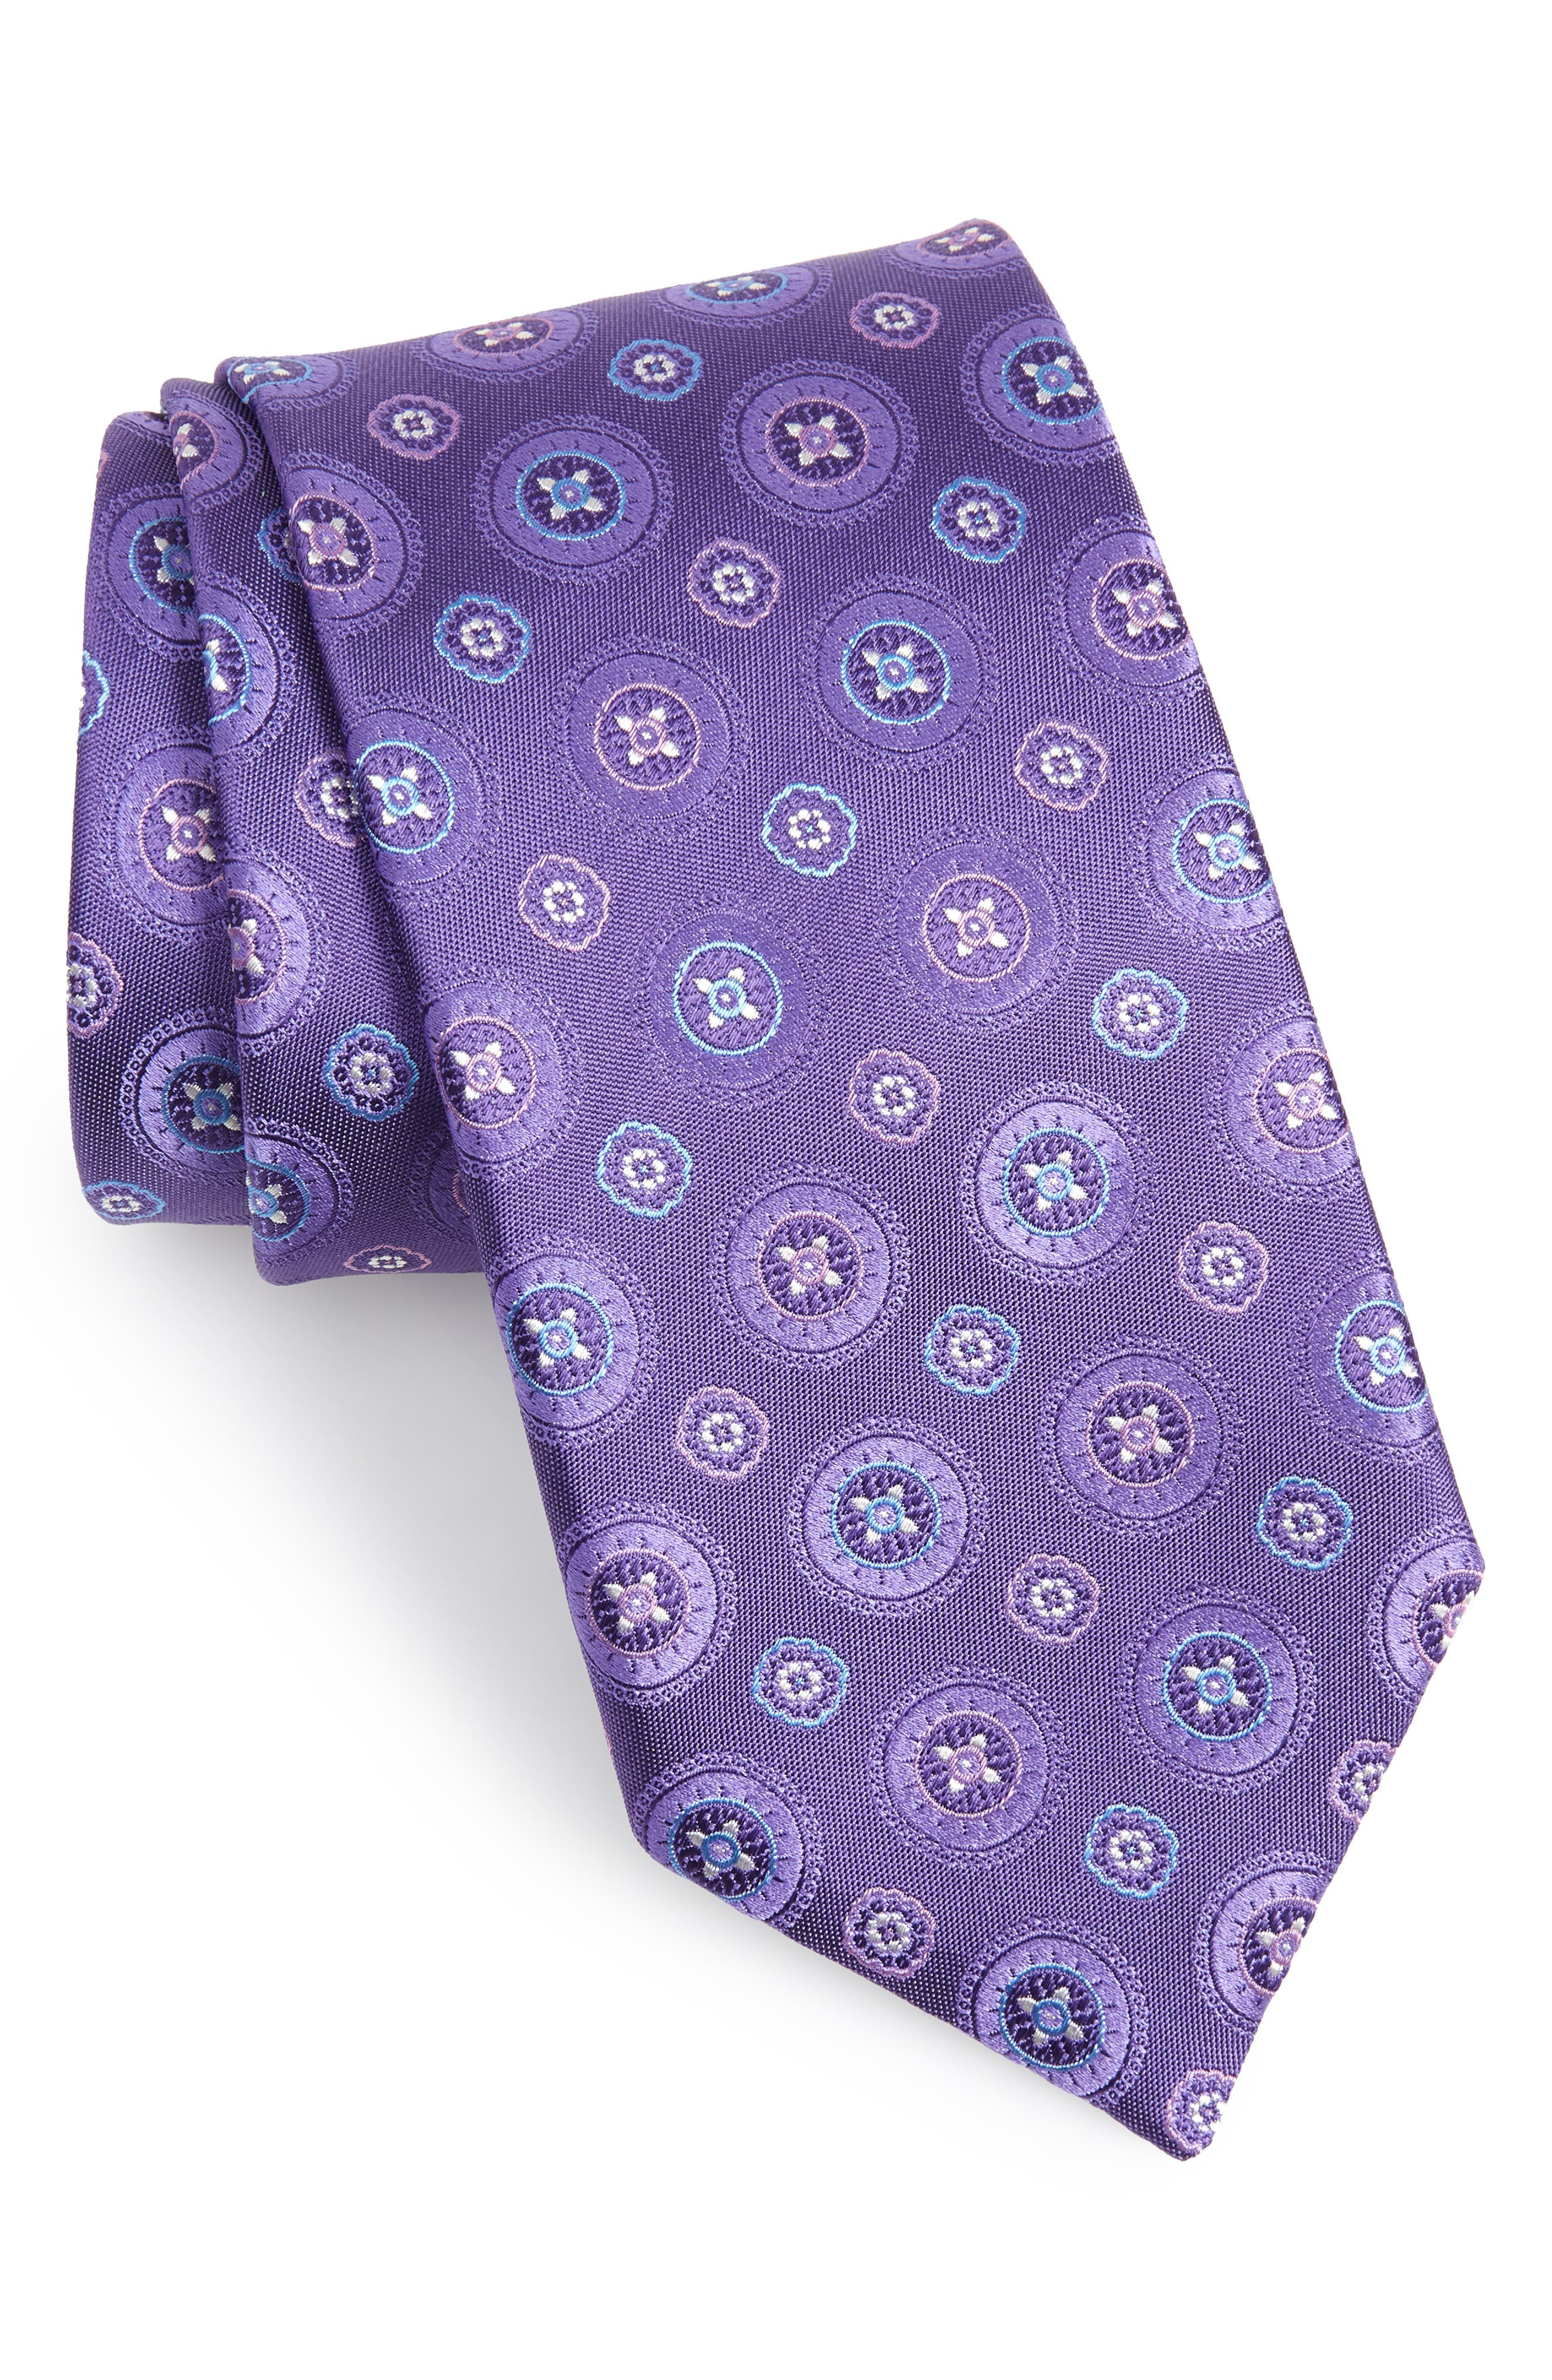 CANALI Medallion Silk Tie, Main, color, LIGHT PURPLE